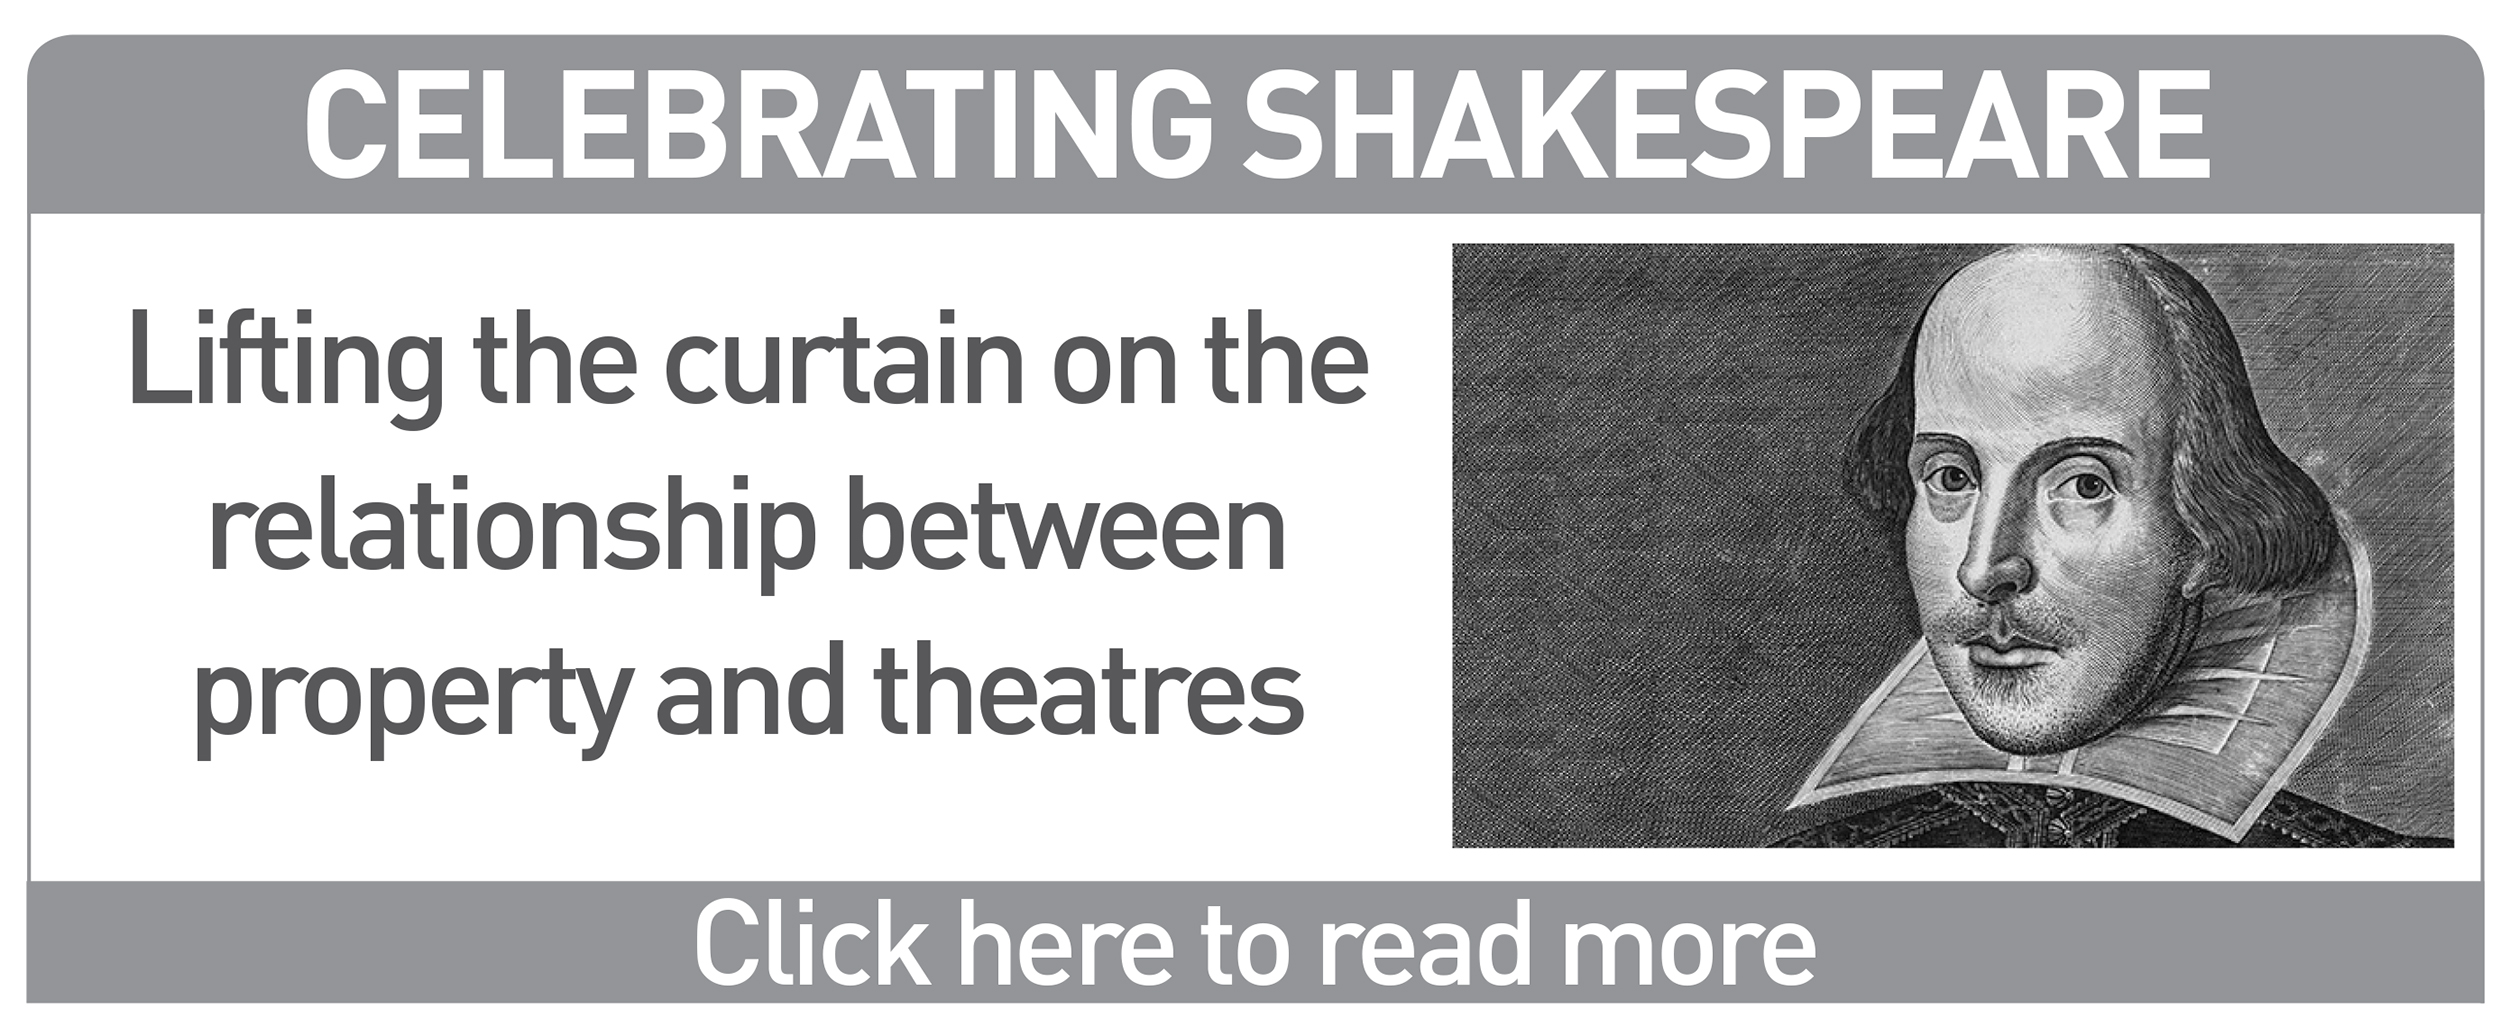 Shakespeare-button-23-April